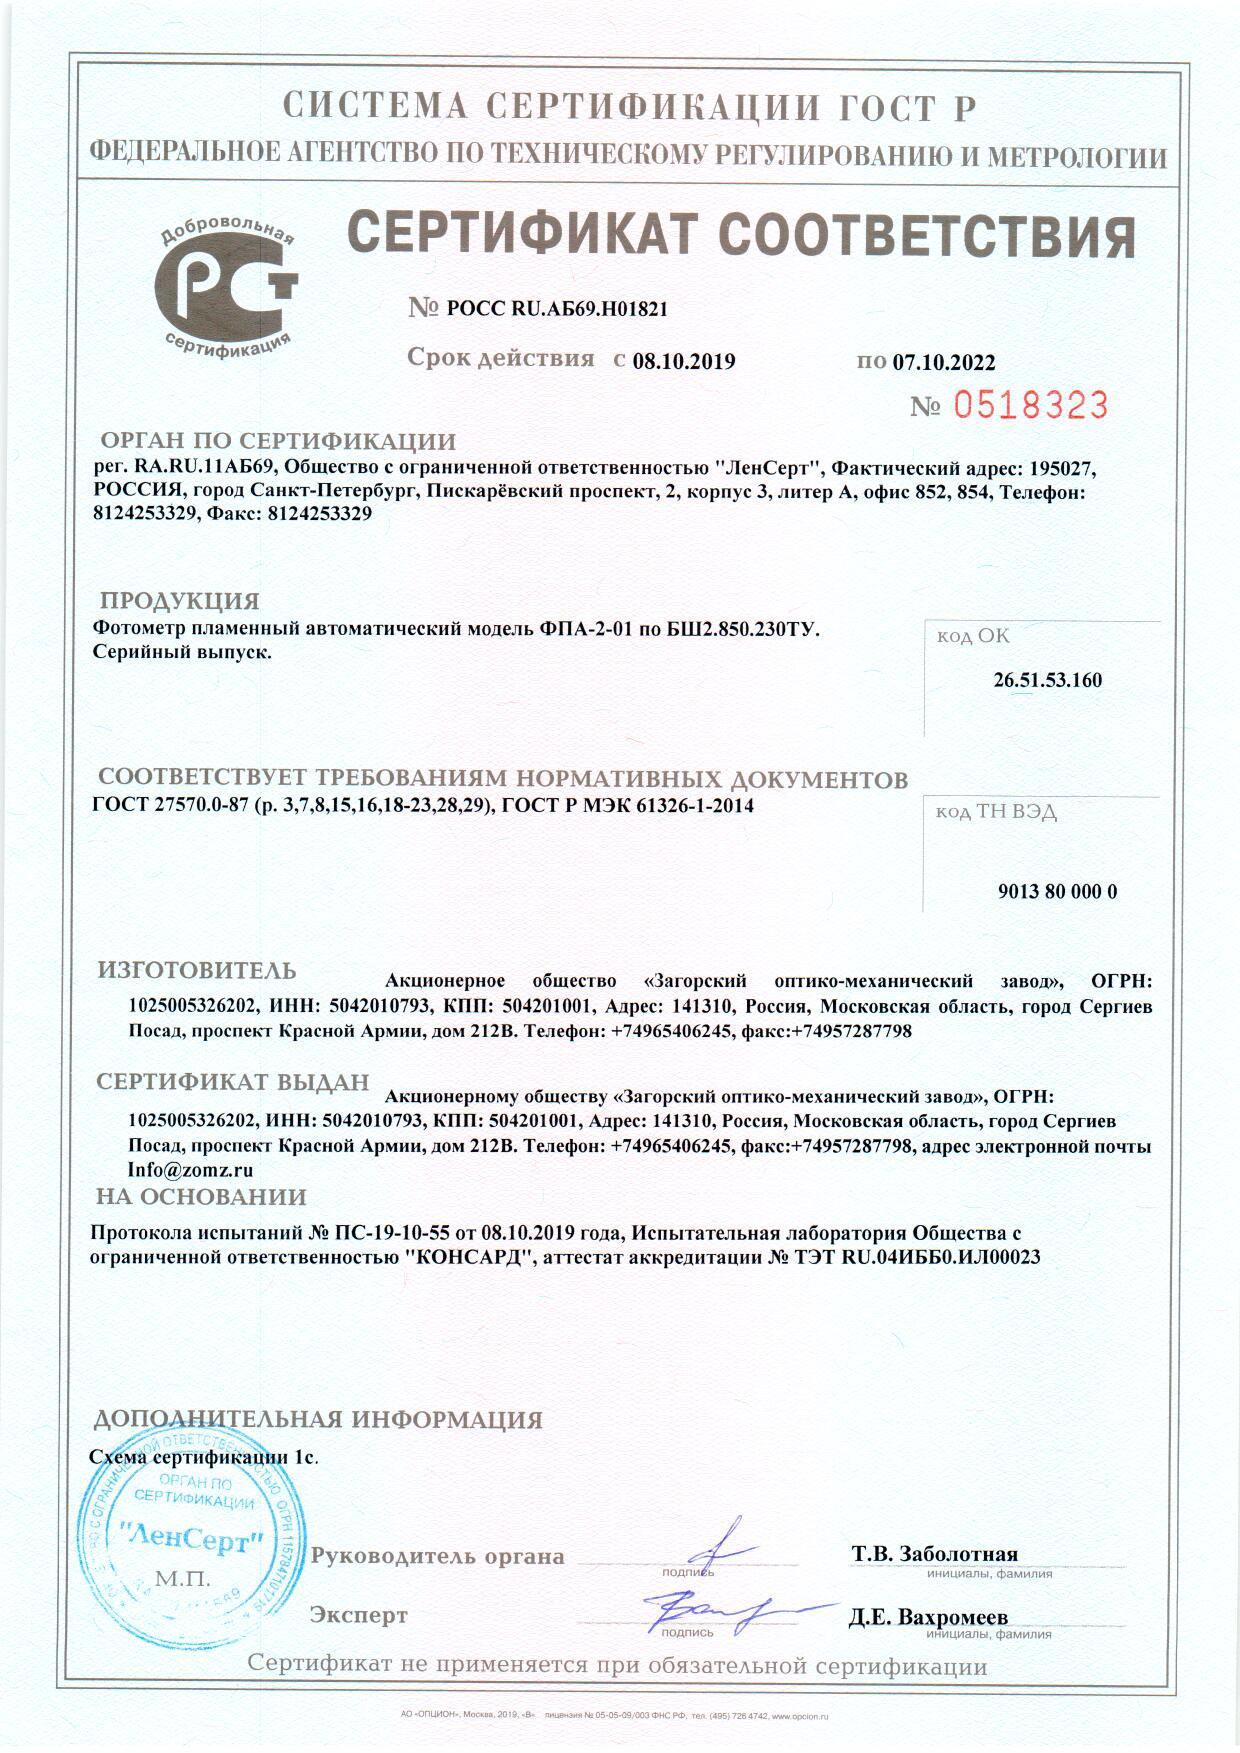 сертификат ФПА-2-01 Фотометр пламенный